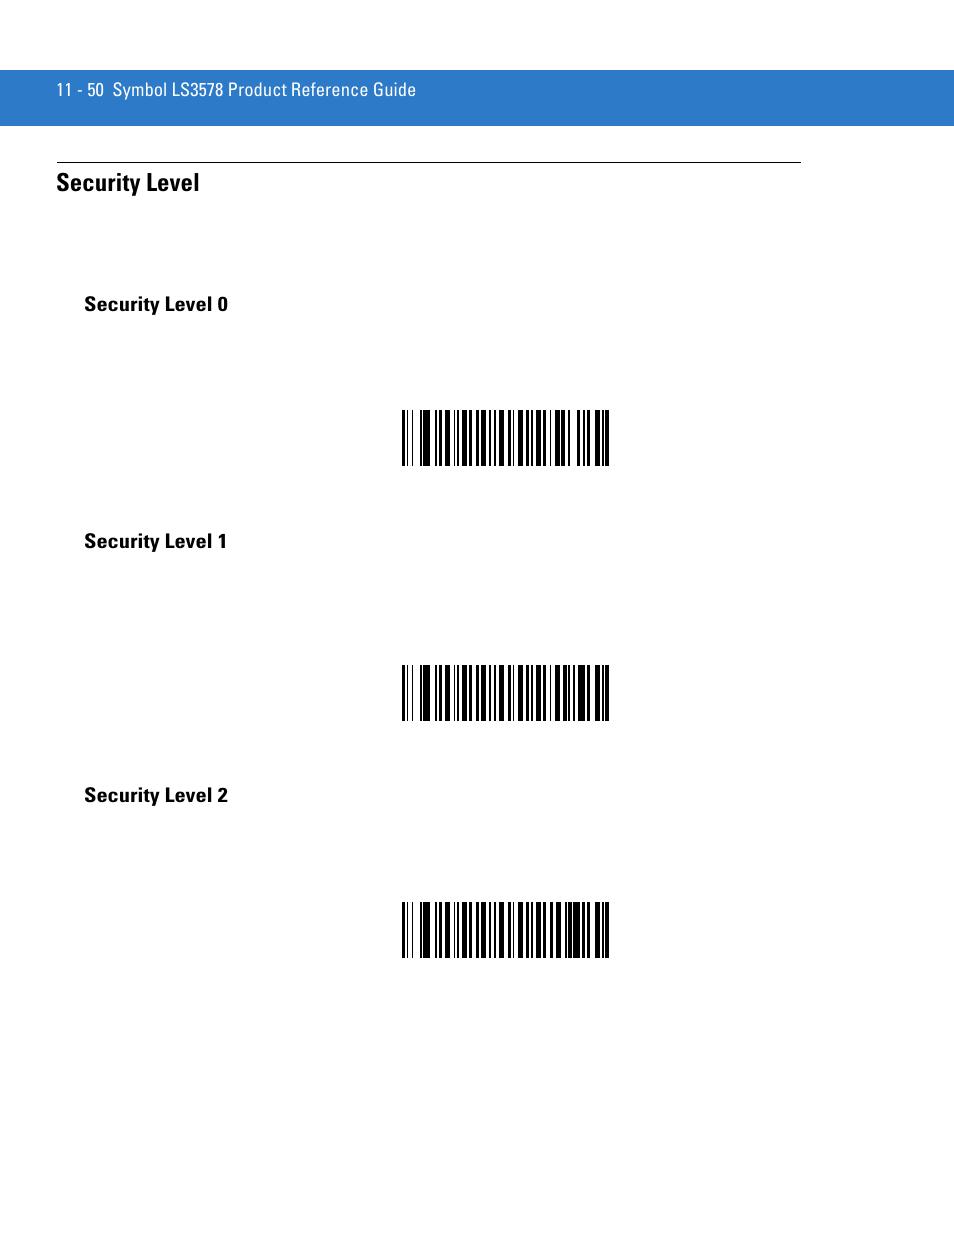 Security Level Security Level 0 Security Level 1 Motorola Ls3578